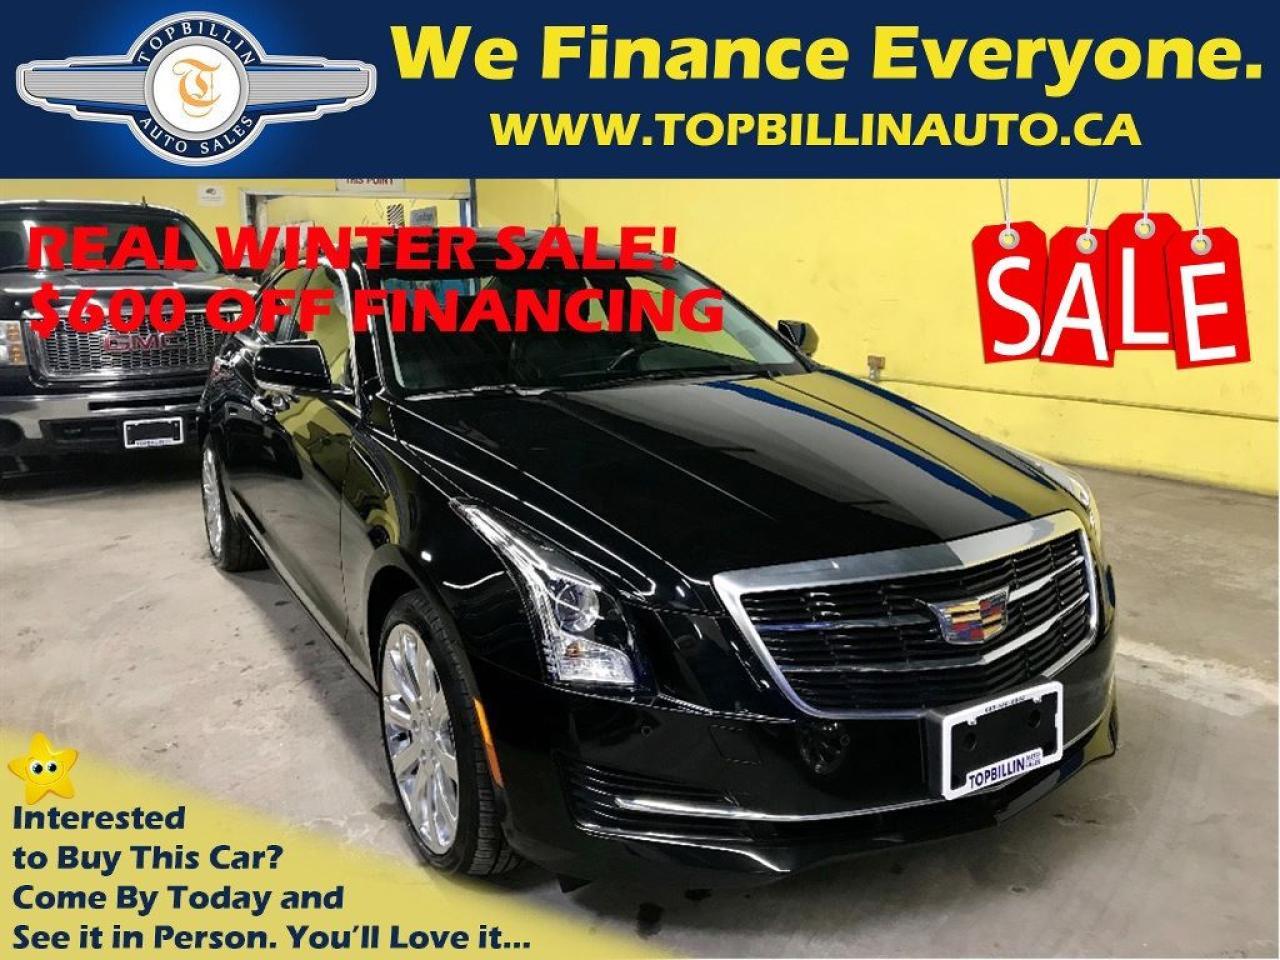 2015 Cadillac ATS AWD 2.0L Turbo Luxury, Navigation 33K kms